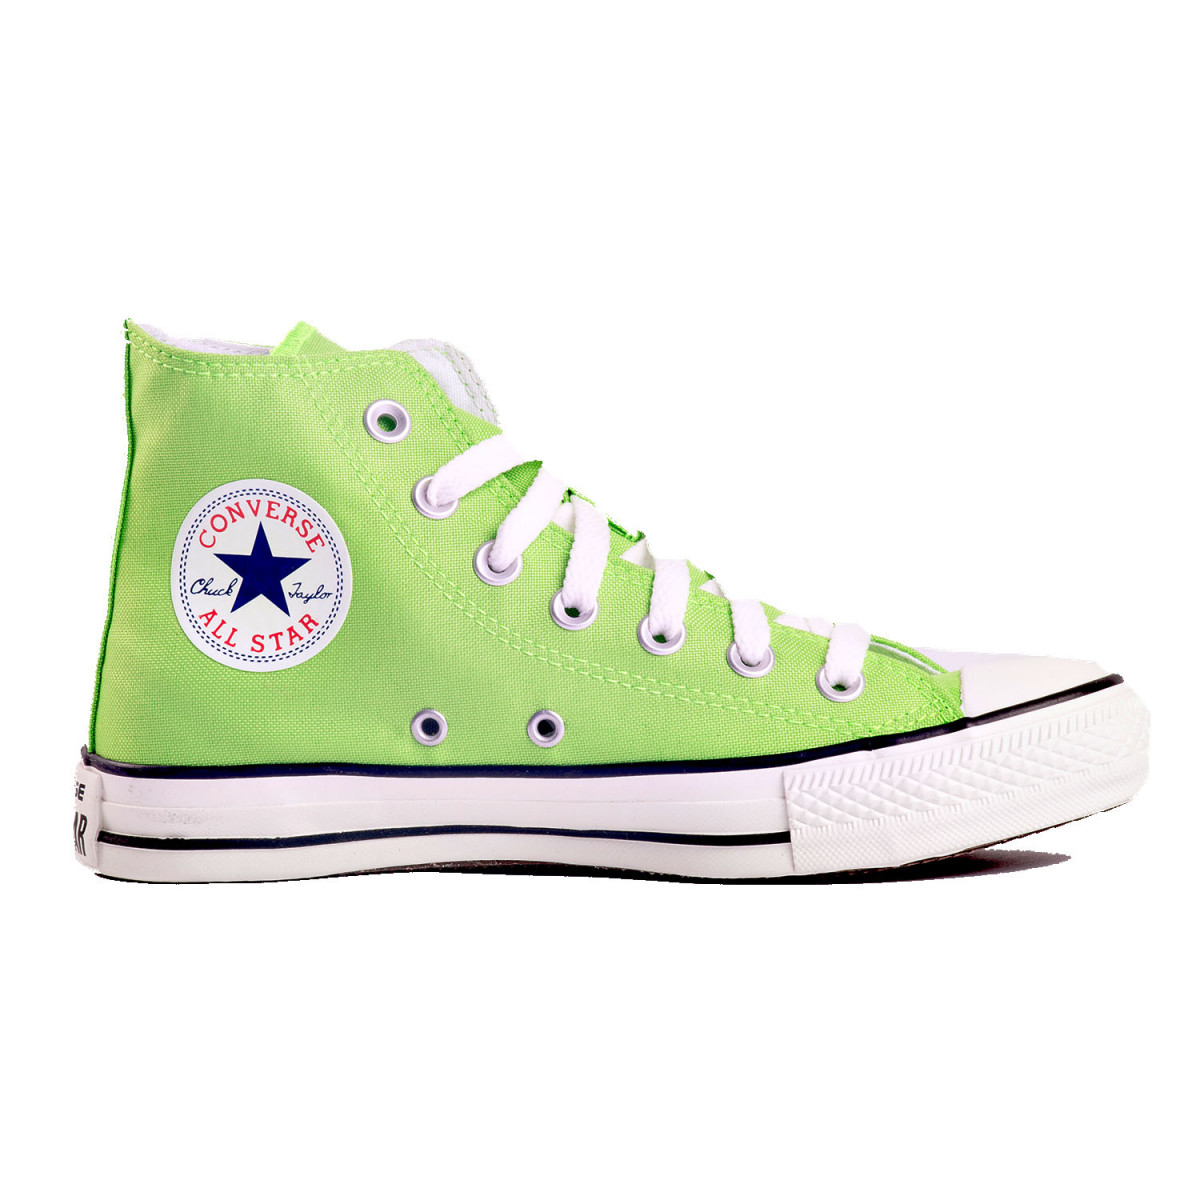 Zapatillas Converse Chuck Taylor All Star Seasonal Hi